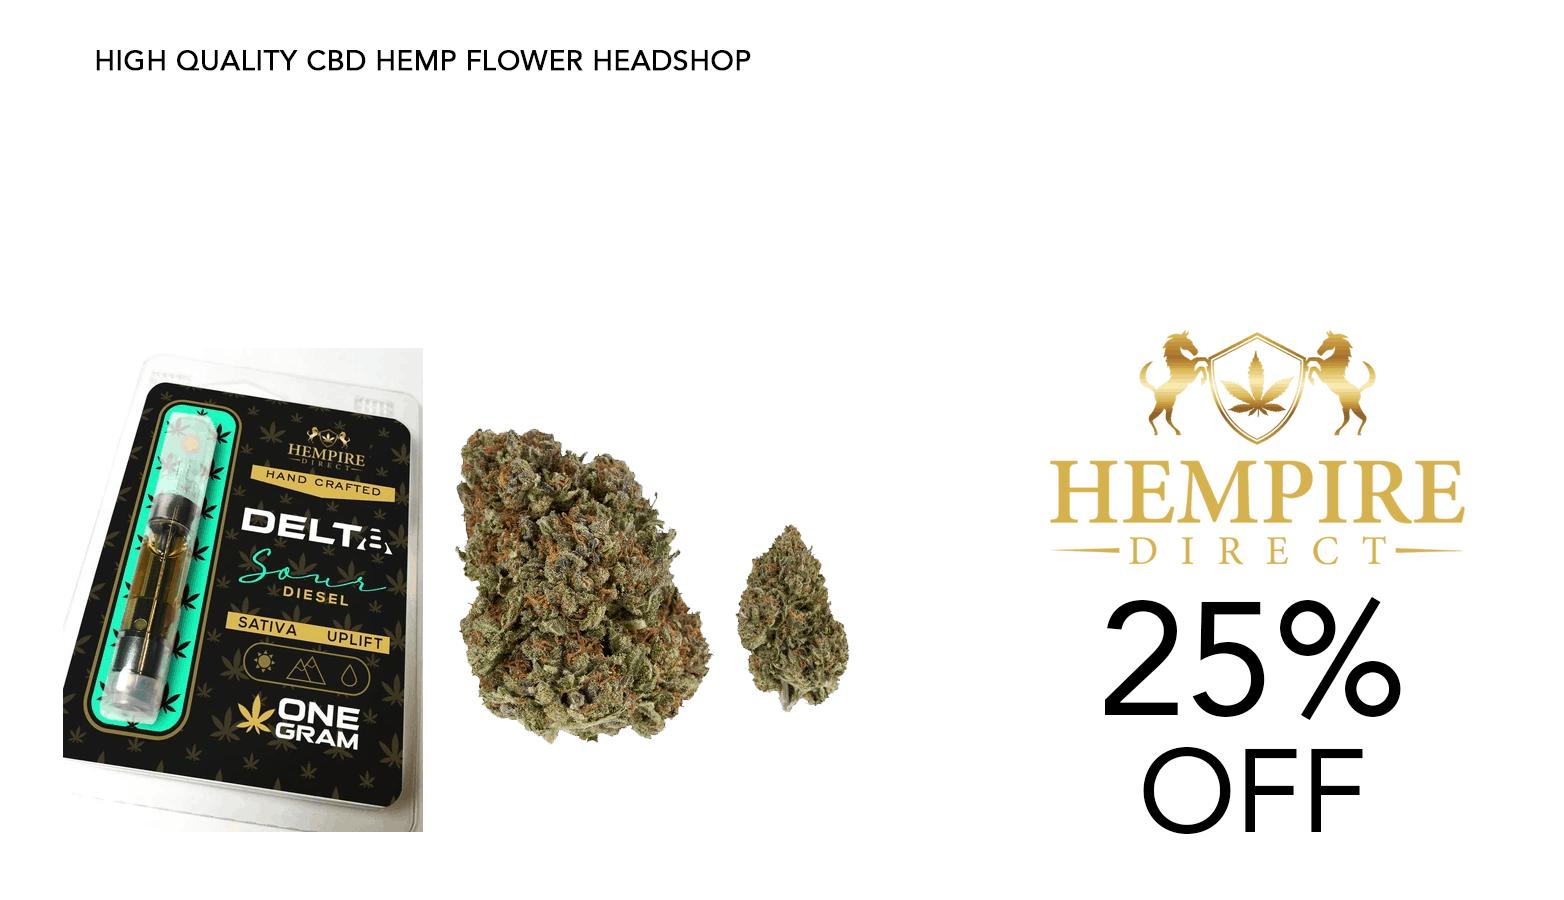 Hempire Direct CBD Coupon Code 25 Percent Off Discount